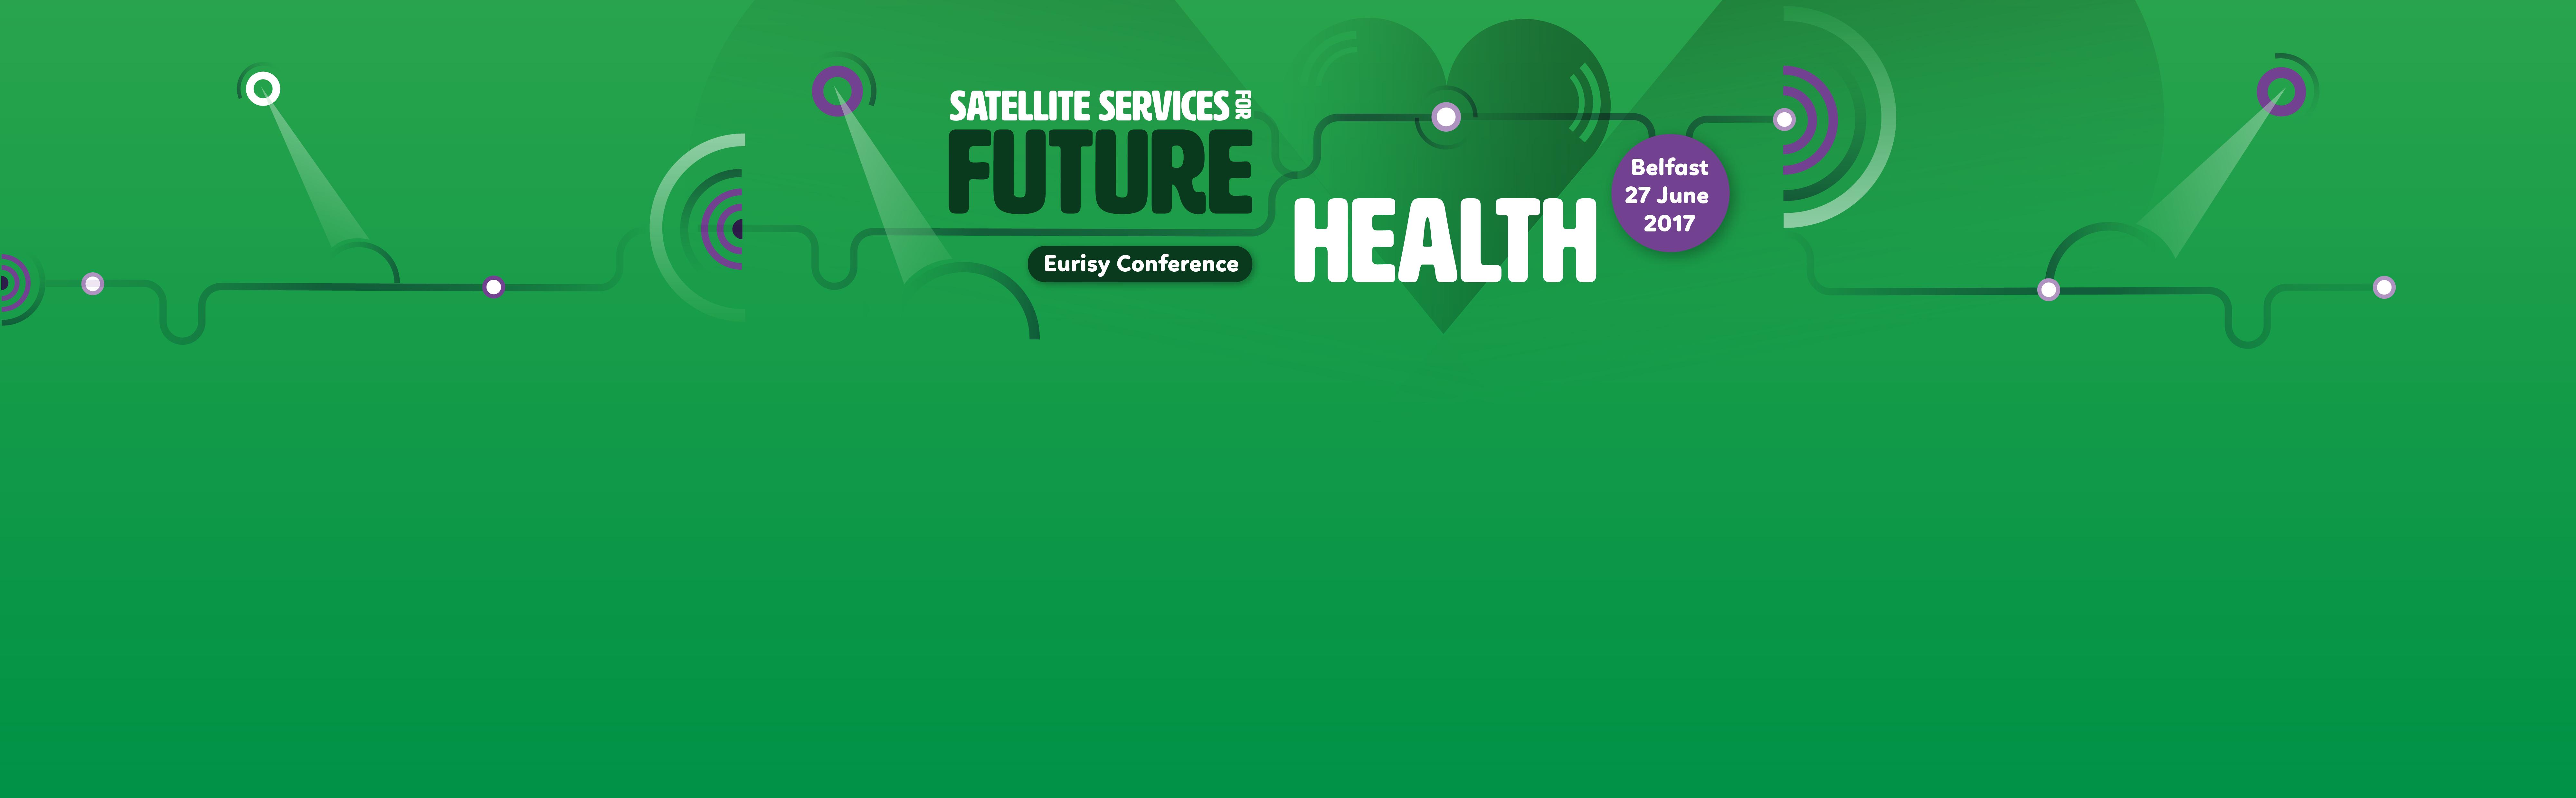 Satellite Services for Future Health